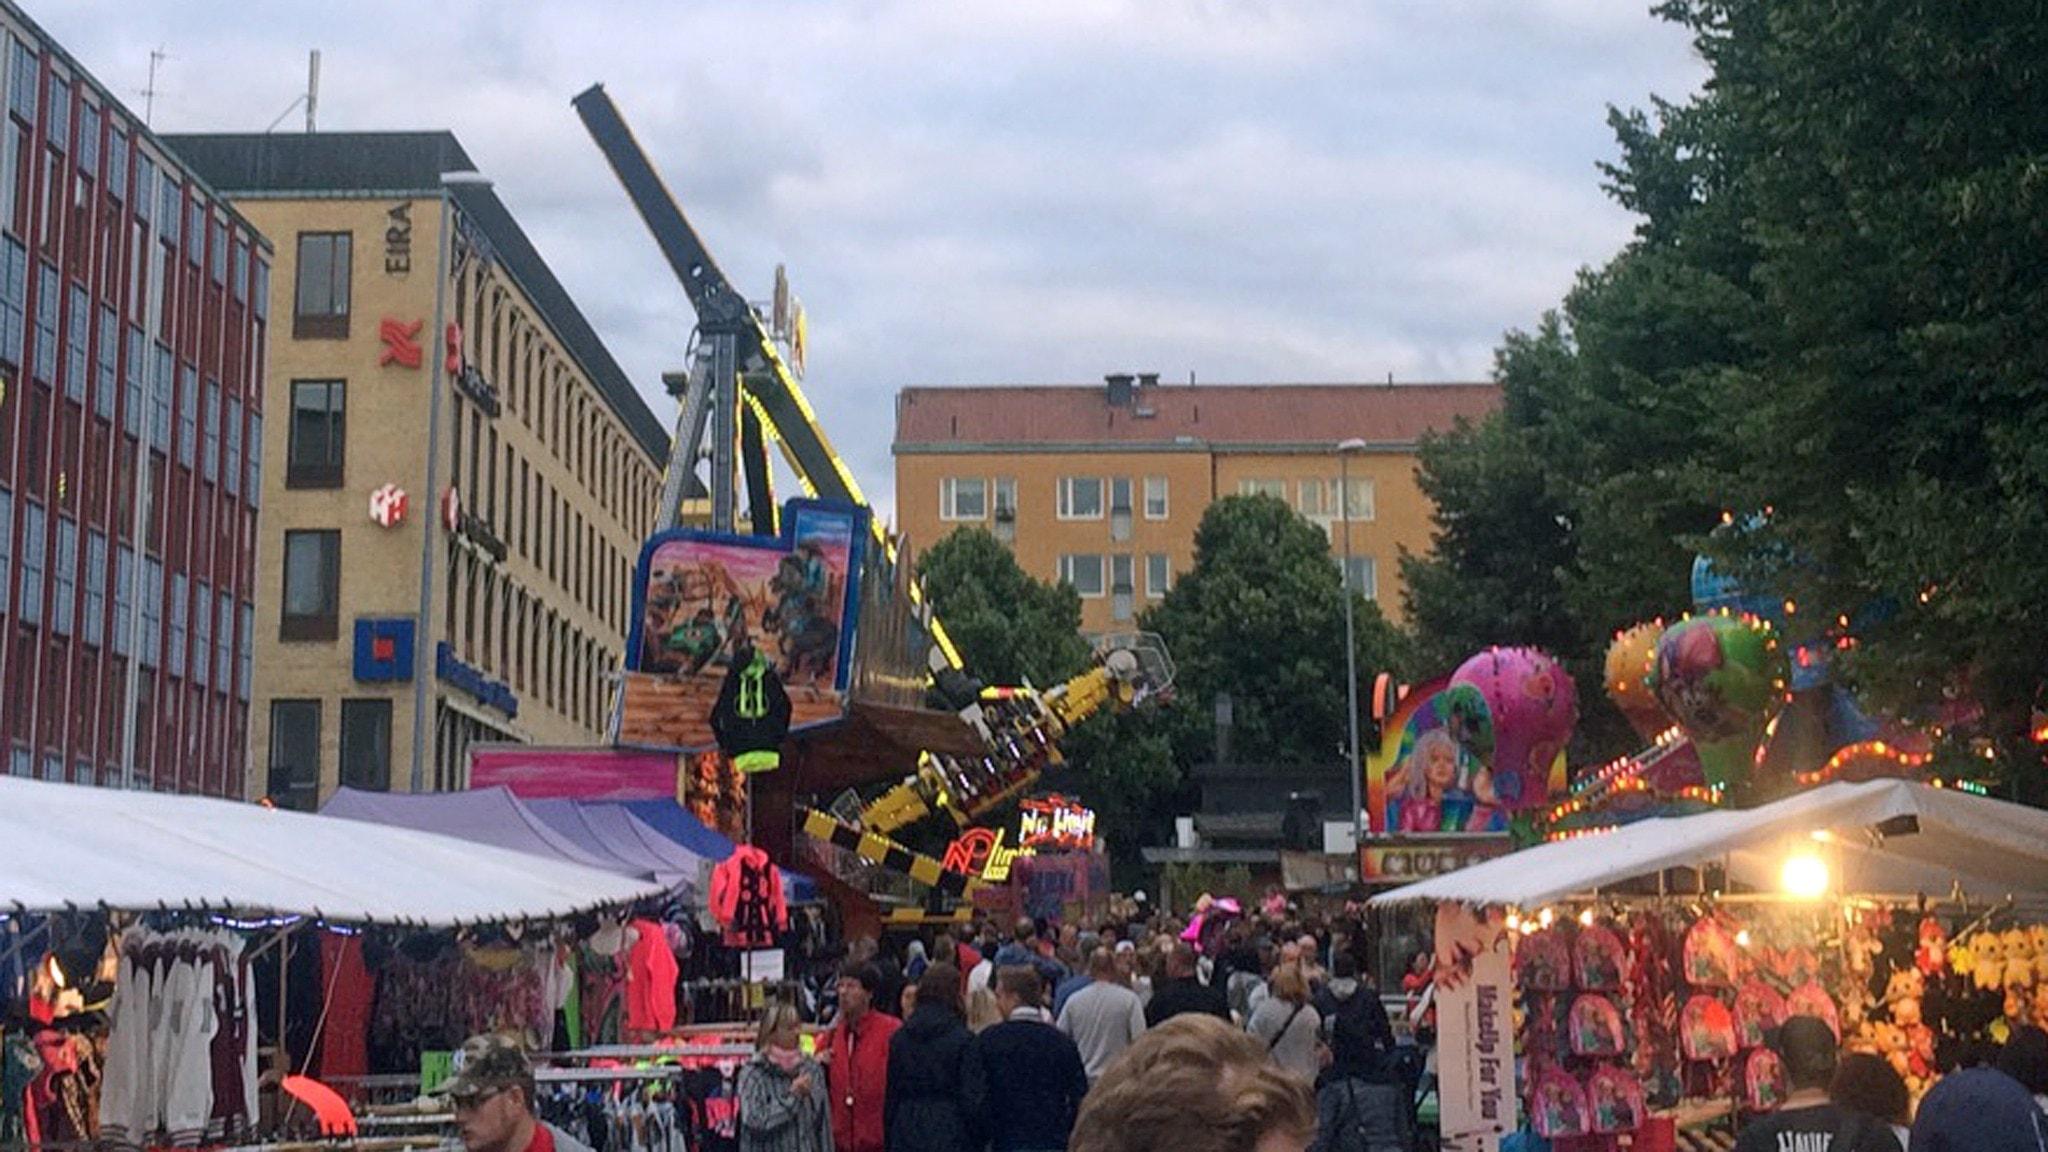 2018 ledsagare avsugning i Gävle